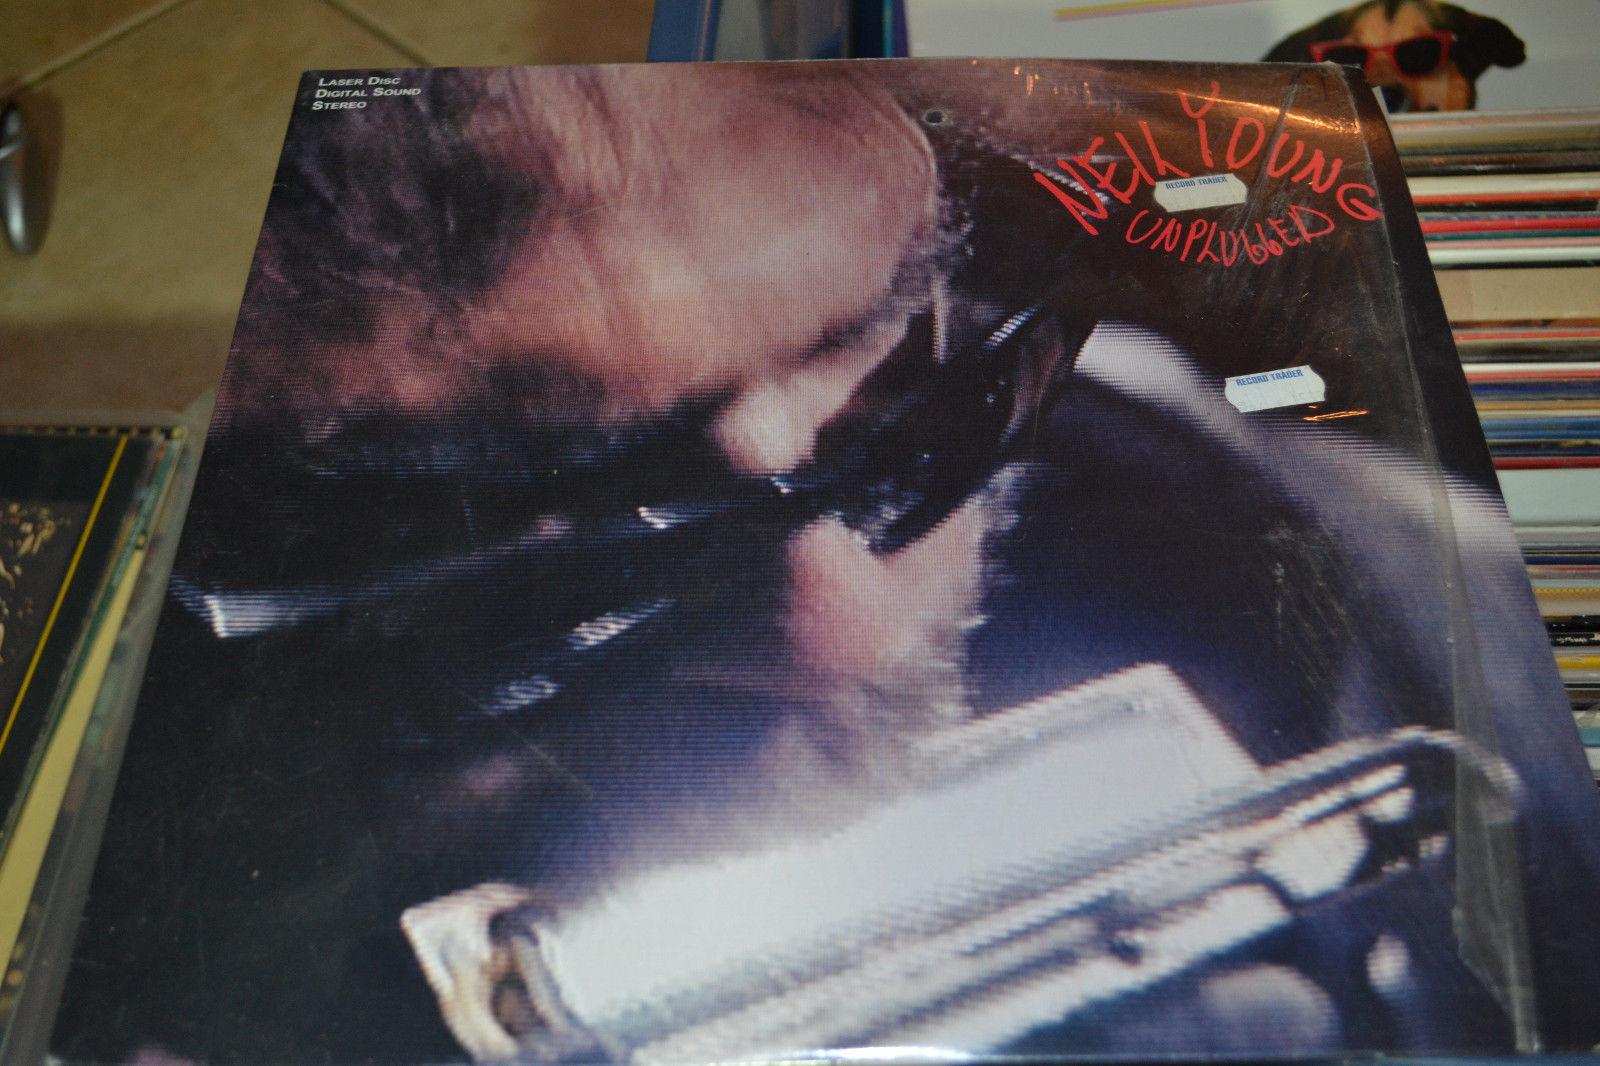 Neil Young: Unplugged (1993) [NTSC] [9 38354-6] Laserdisc